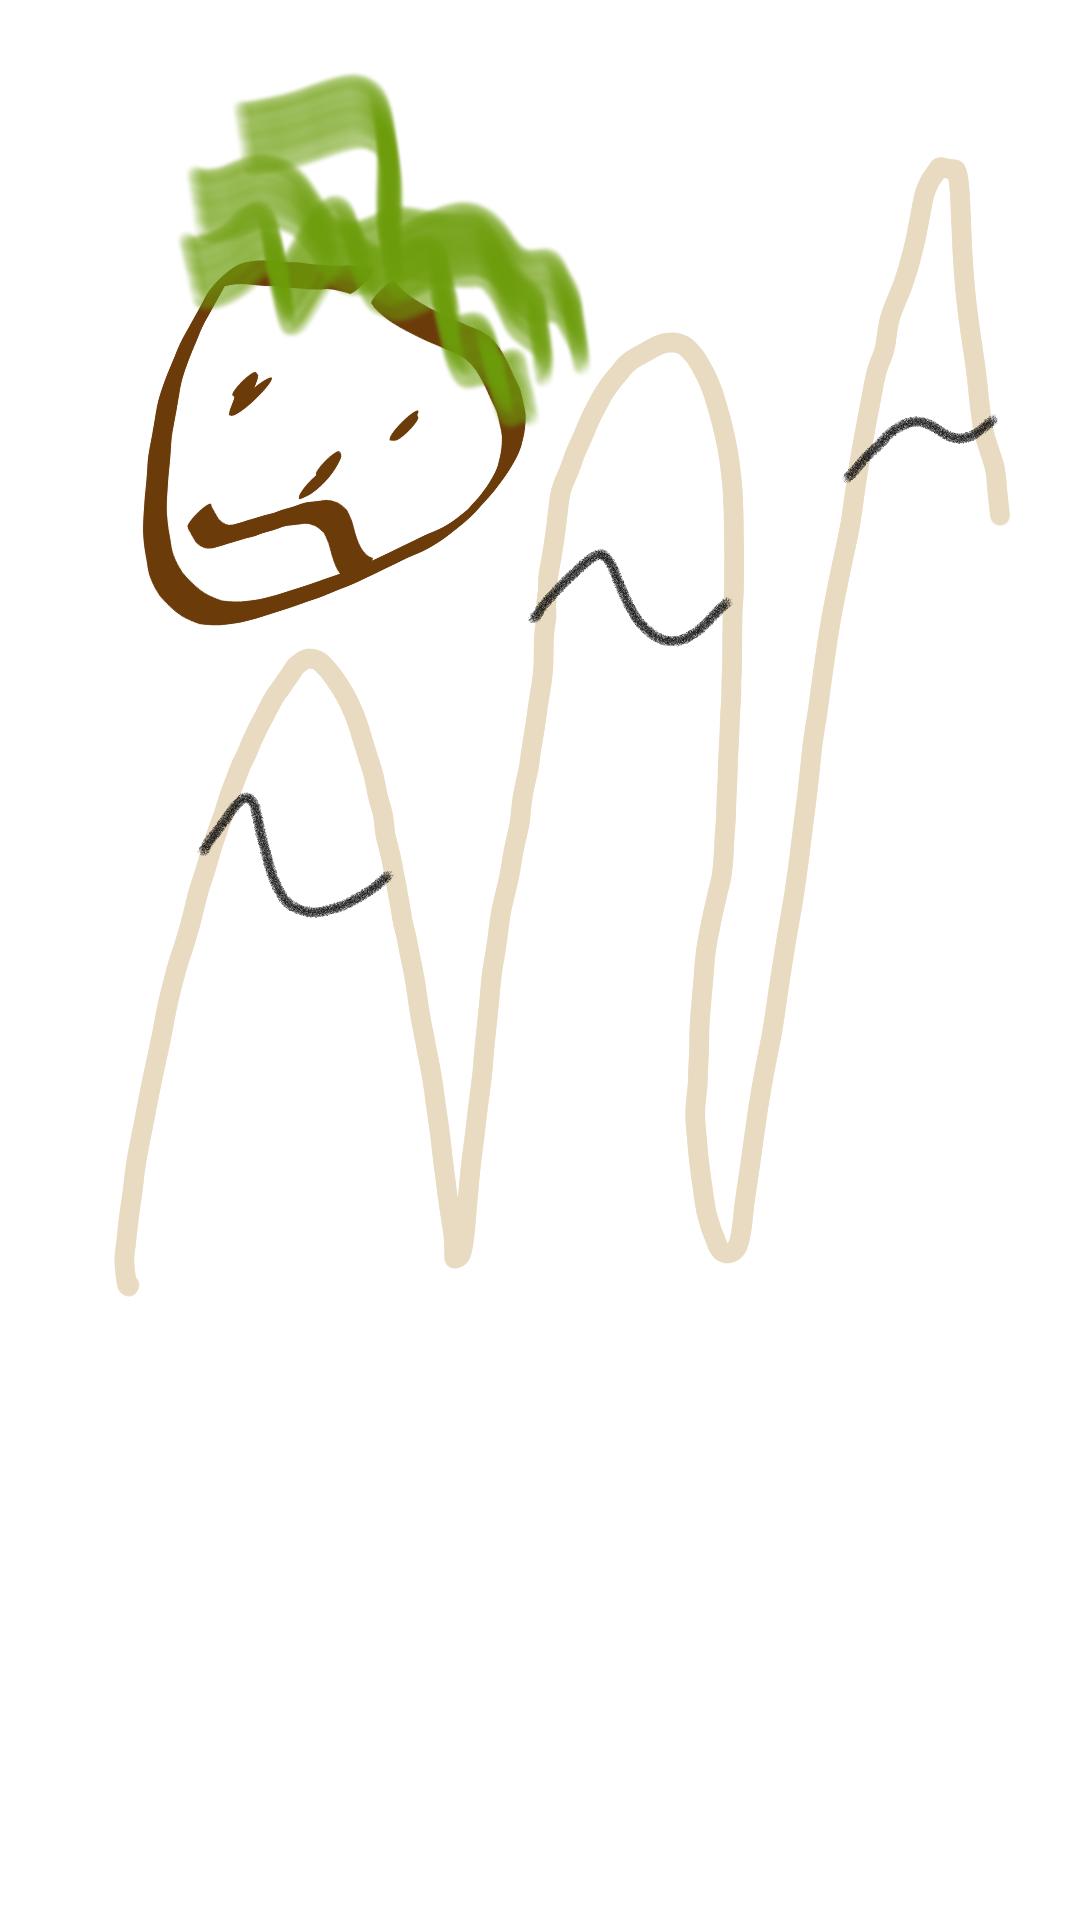 sketch-1556850253571.png